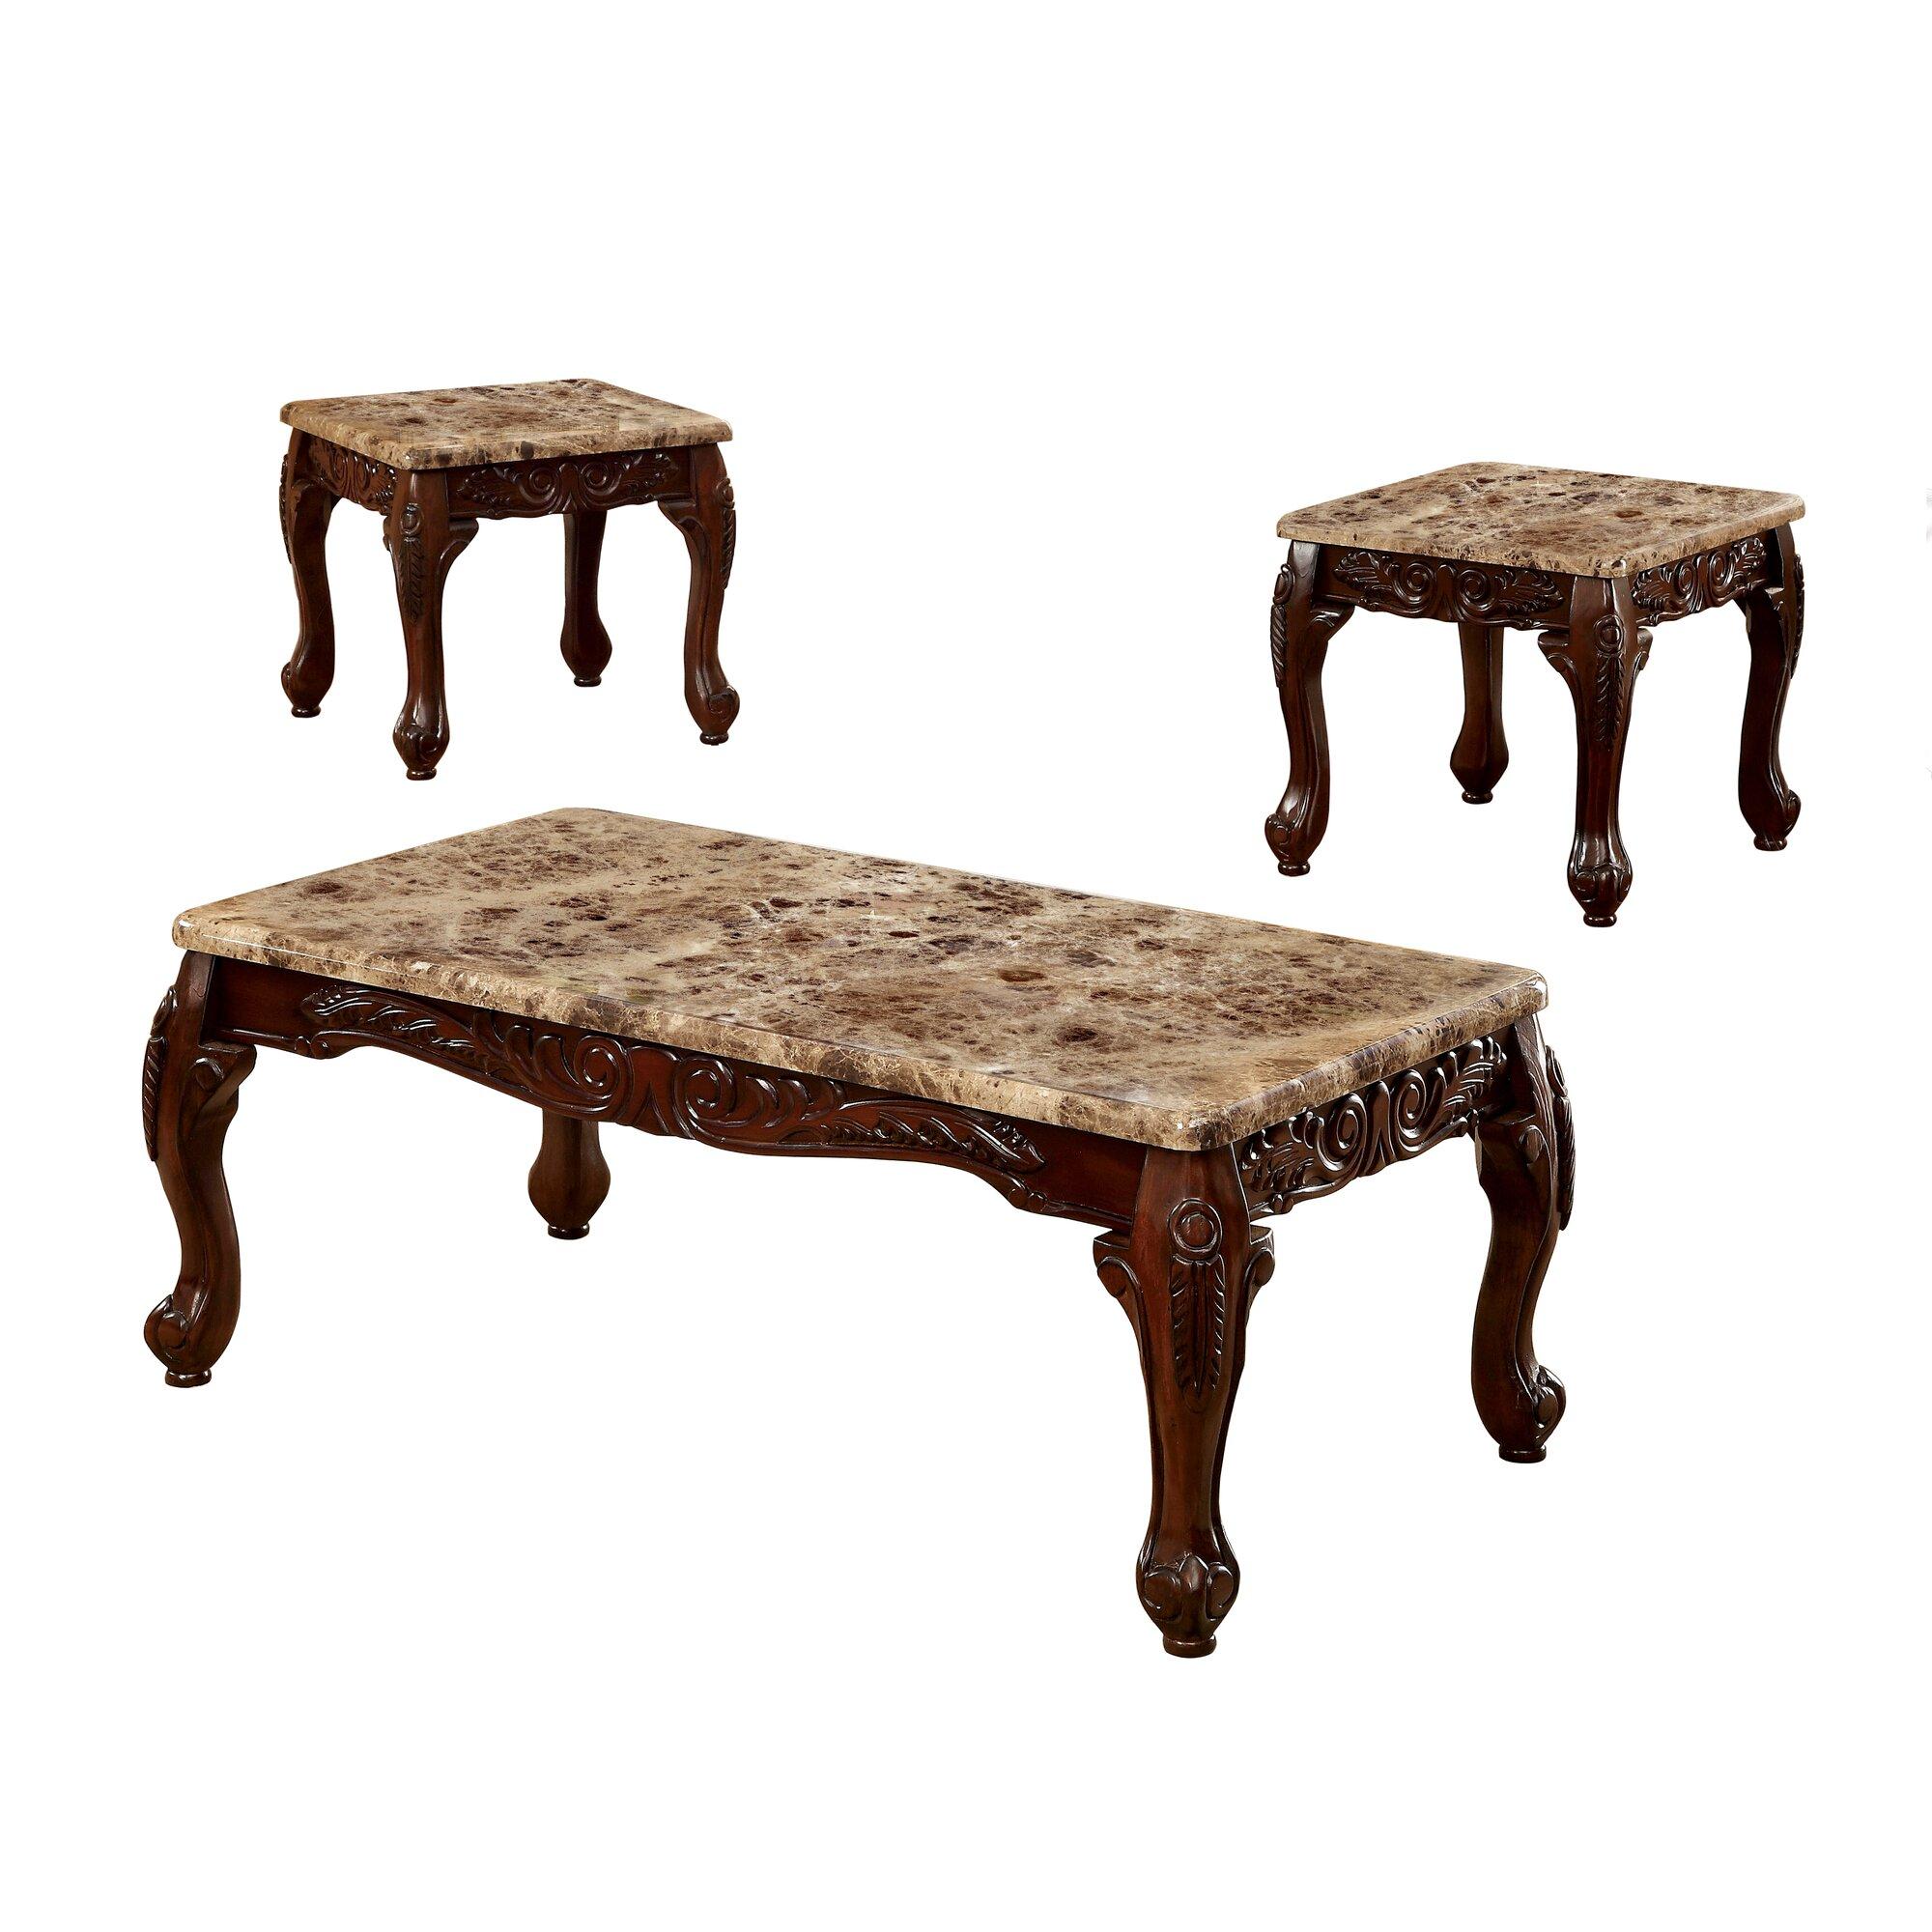 3 Piece Living Room Tables – Living Room Design Inspirations